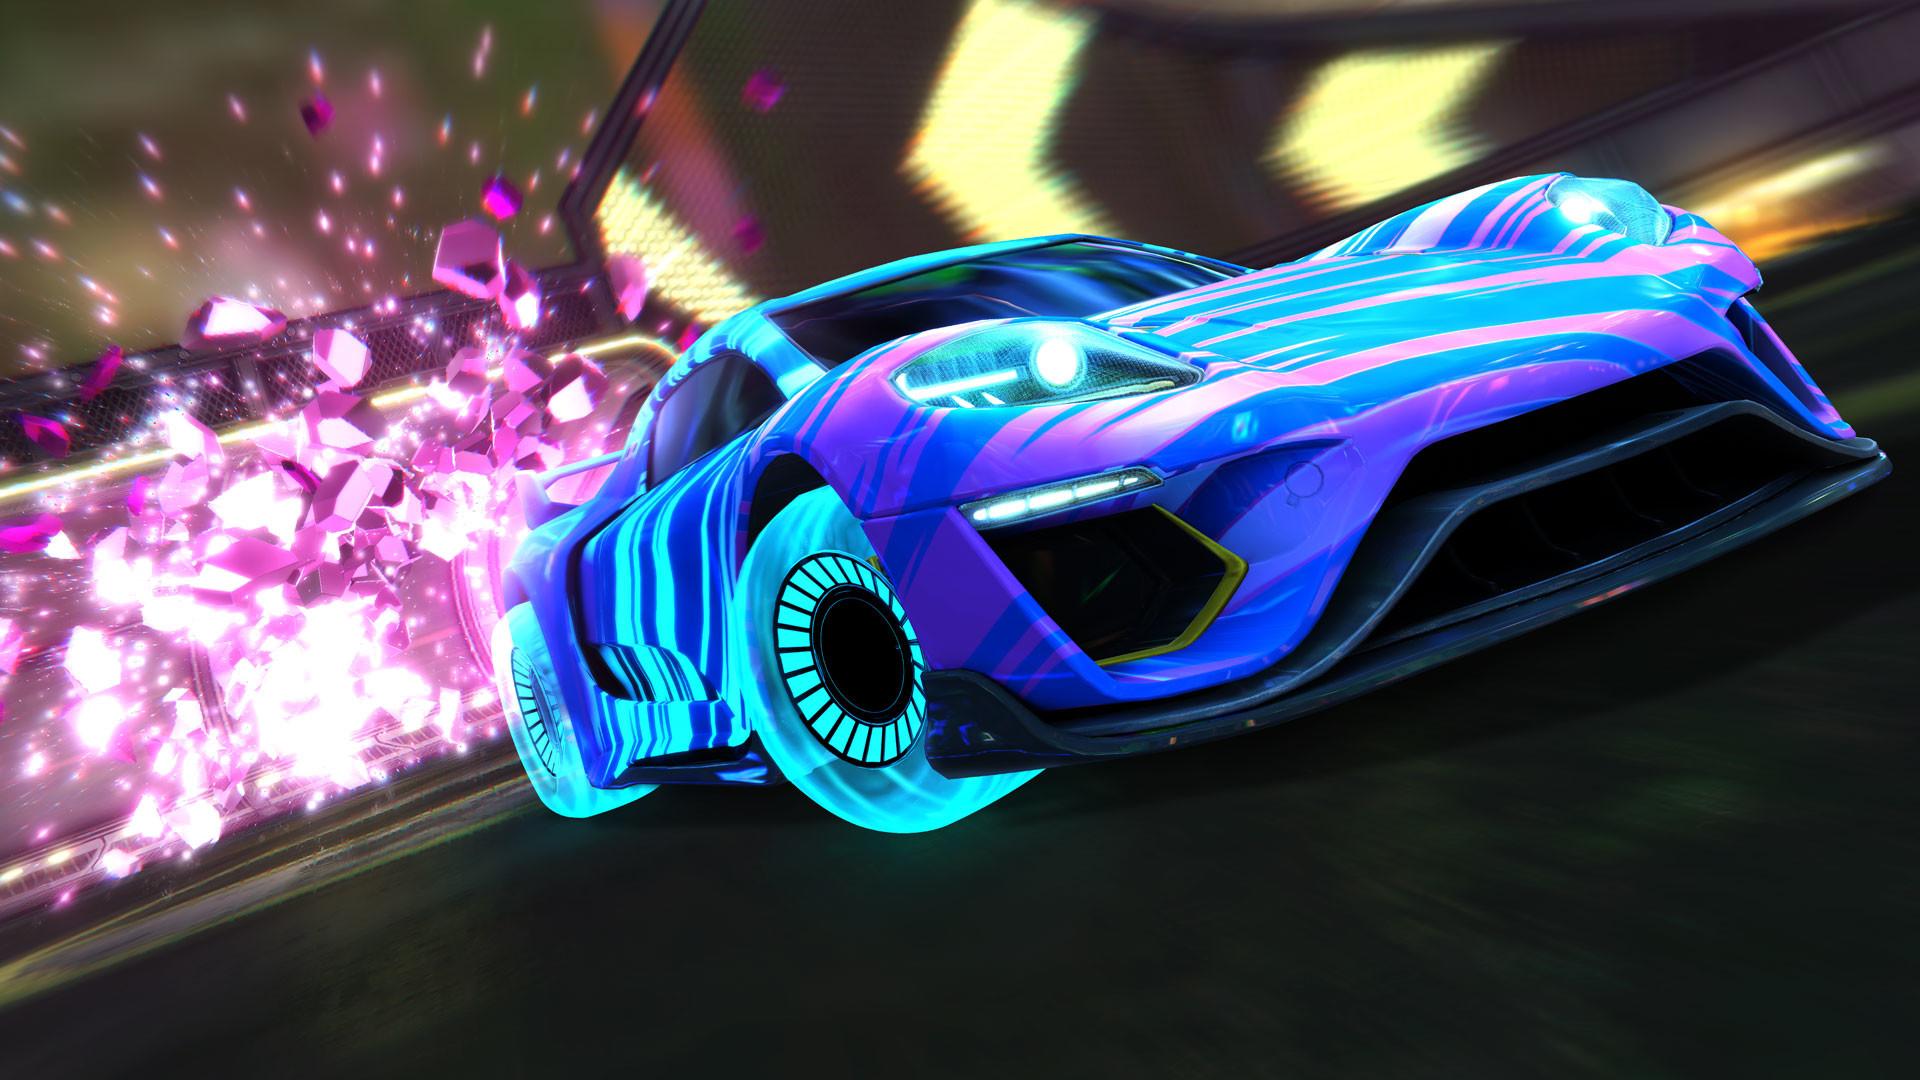 Rocket League®